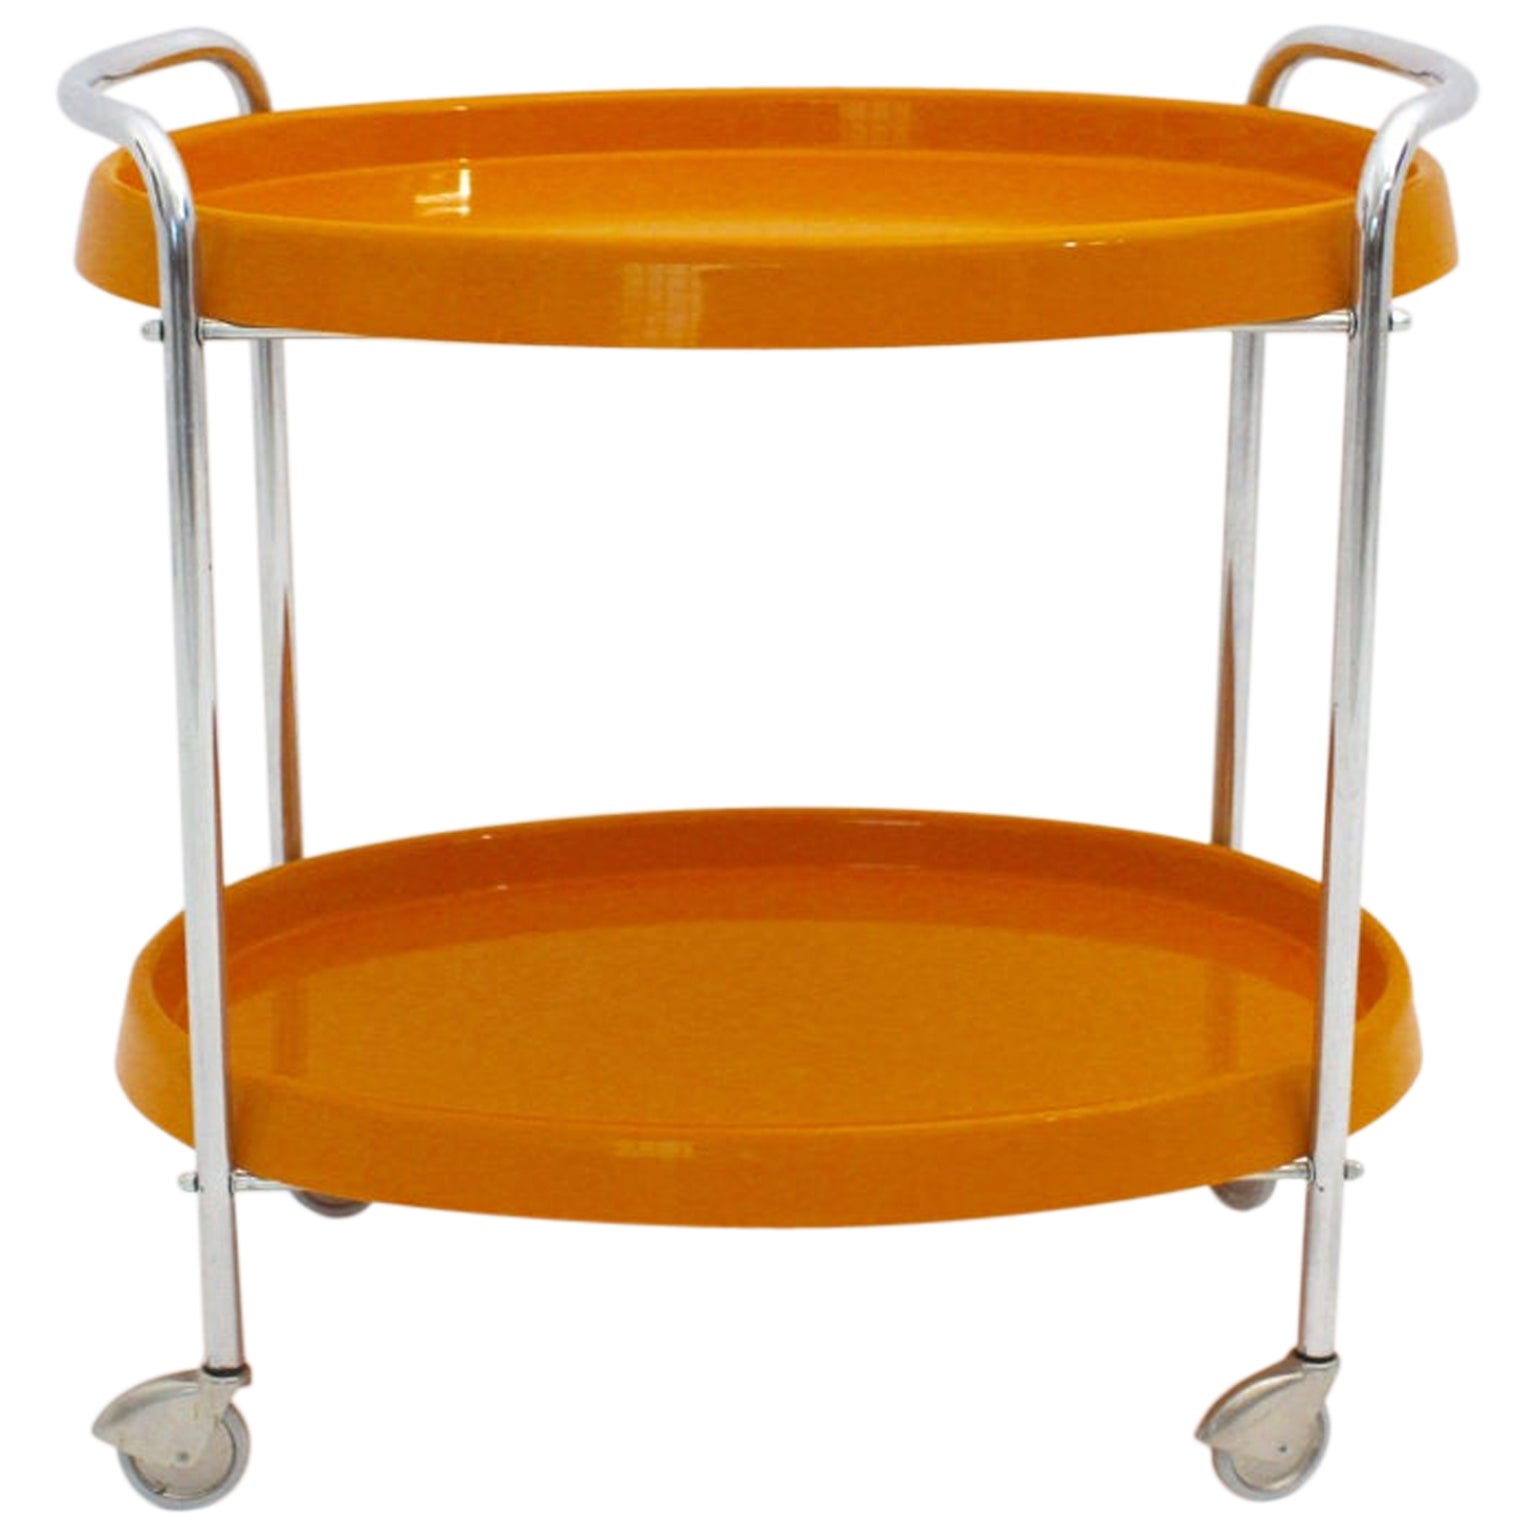 Space Age Vintage Orange Plastic Chromed Bar Cart, 1960s